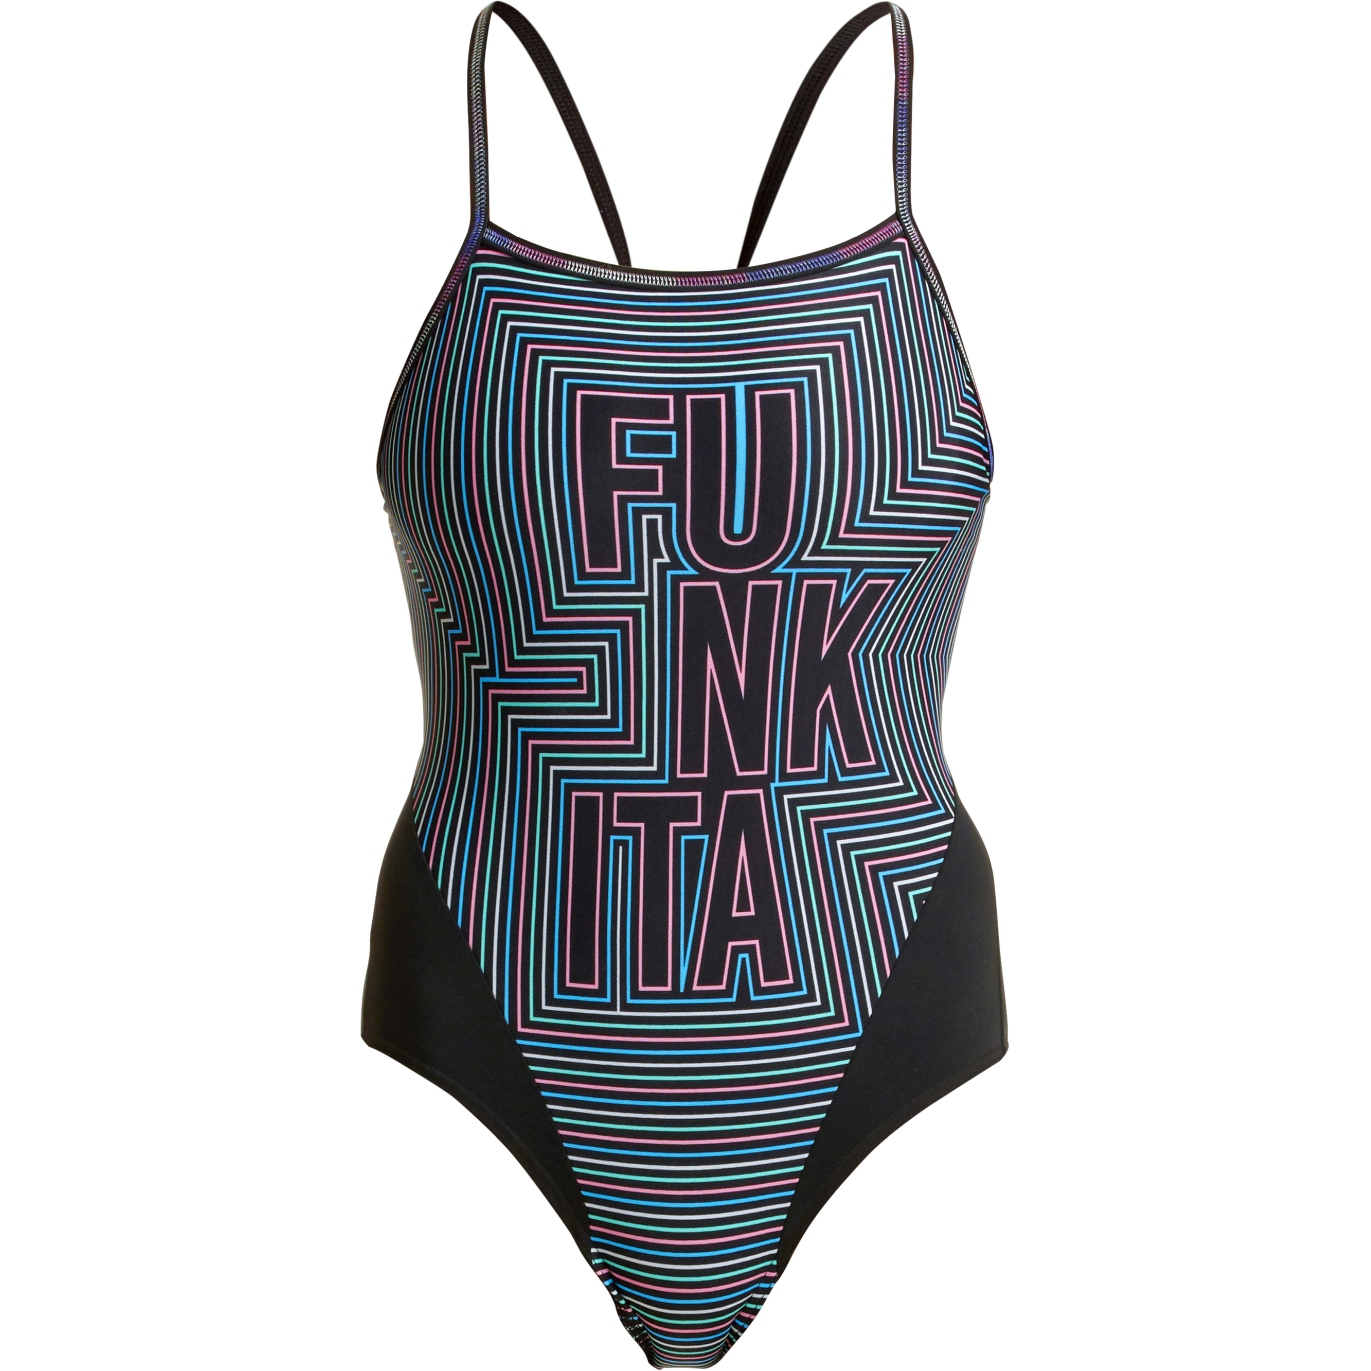 Funkita Ladies Single Strap One Piece Swimsuit - Use Your Illusion